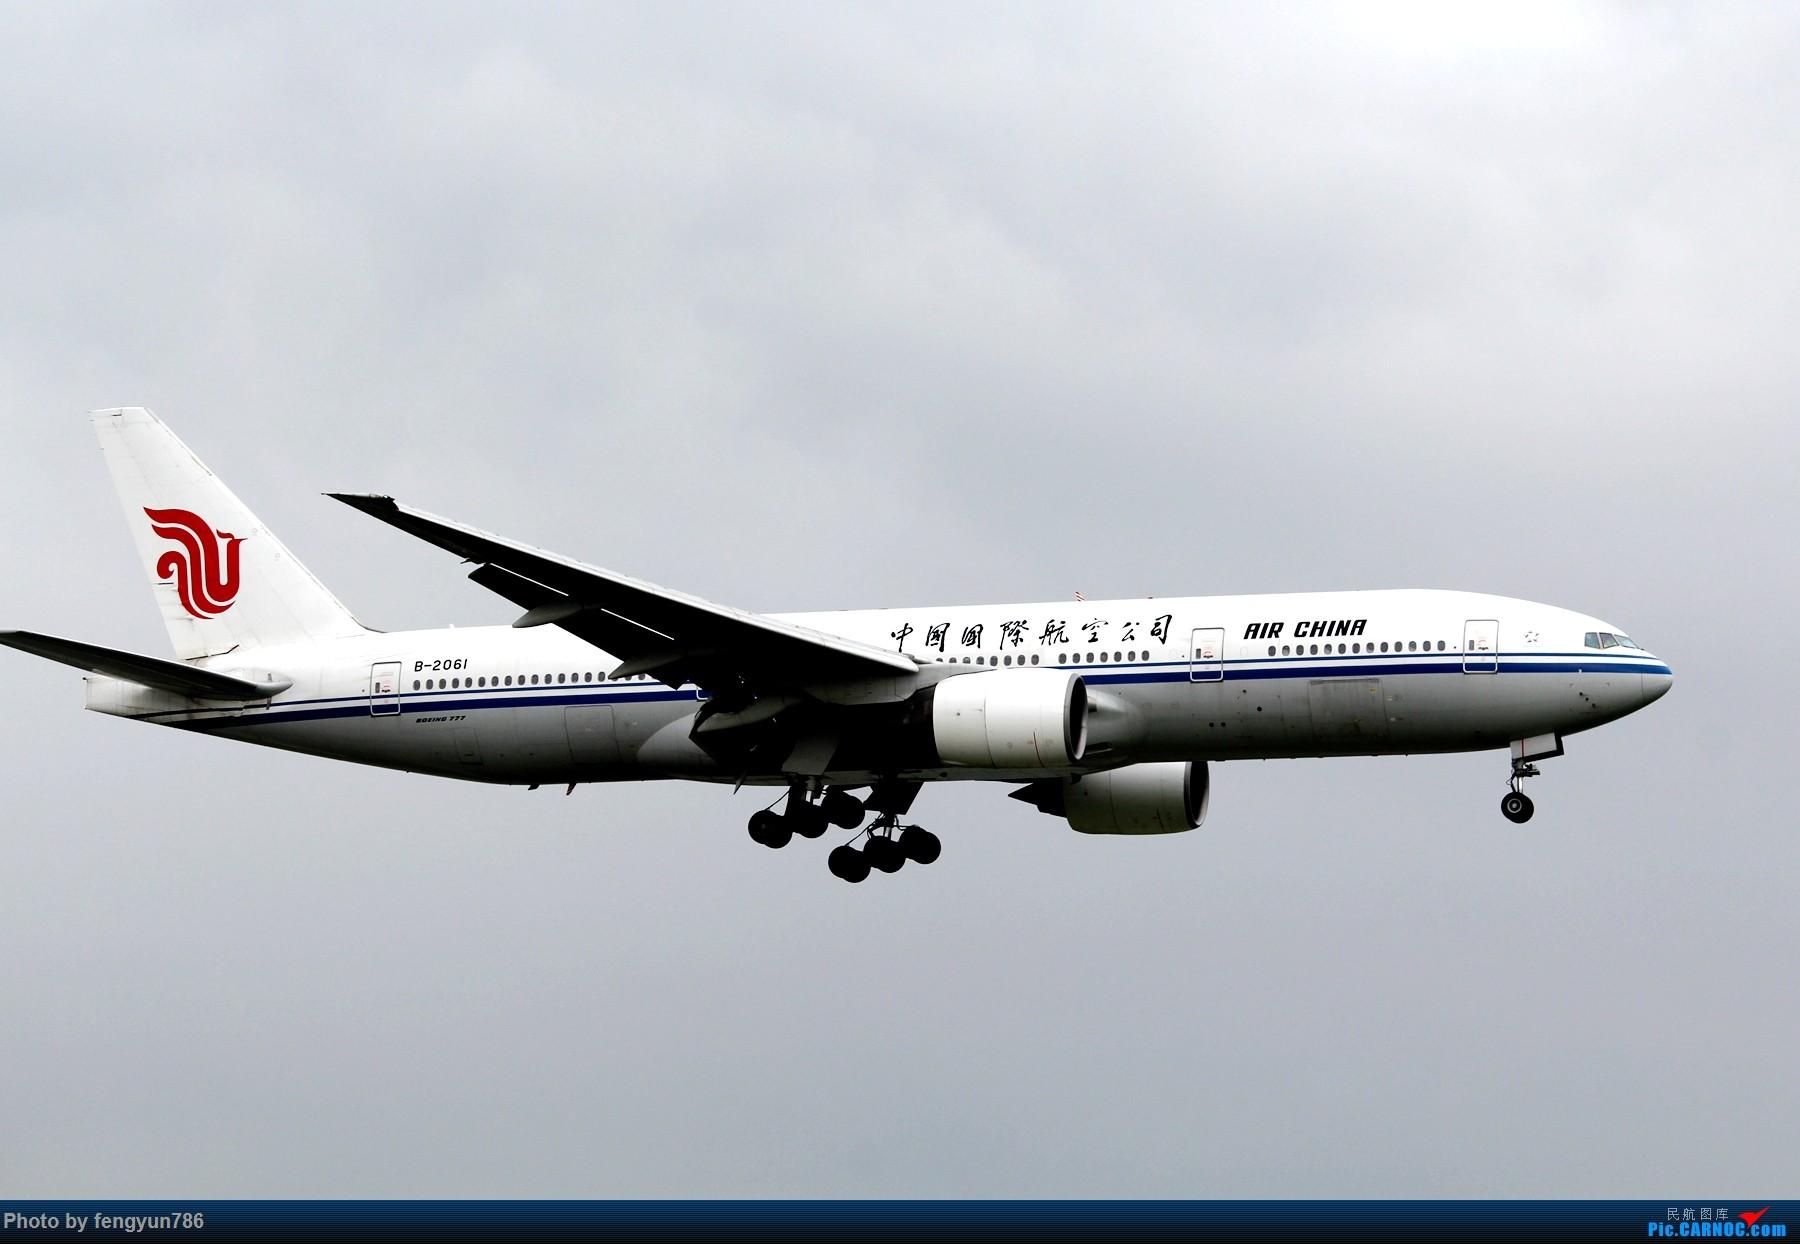 Re:[原创]新人首贴,6.18 SHA流水账 BOEING 777-200 B-2061 中国上海虹桥国际机场